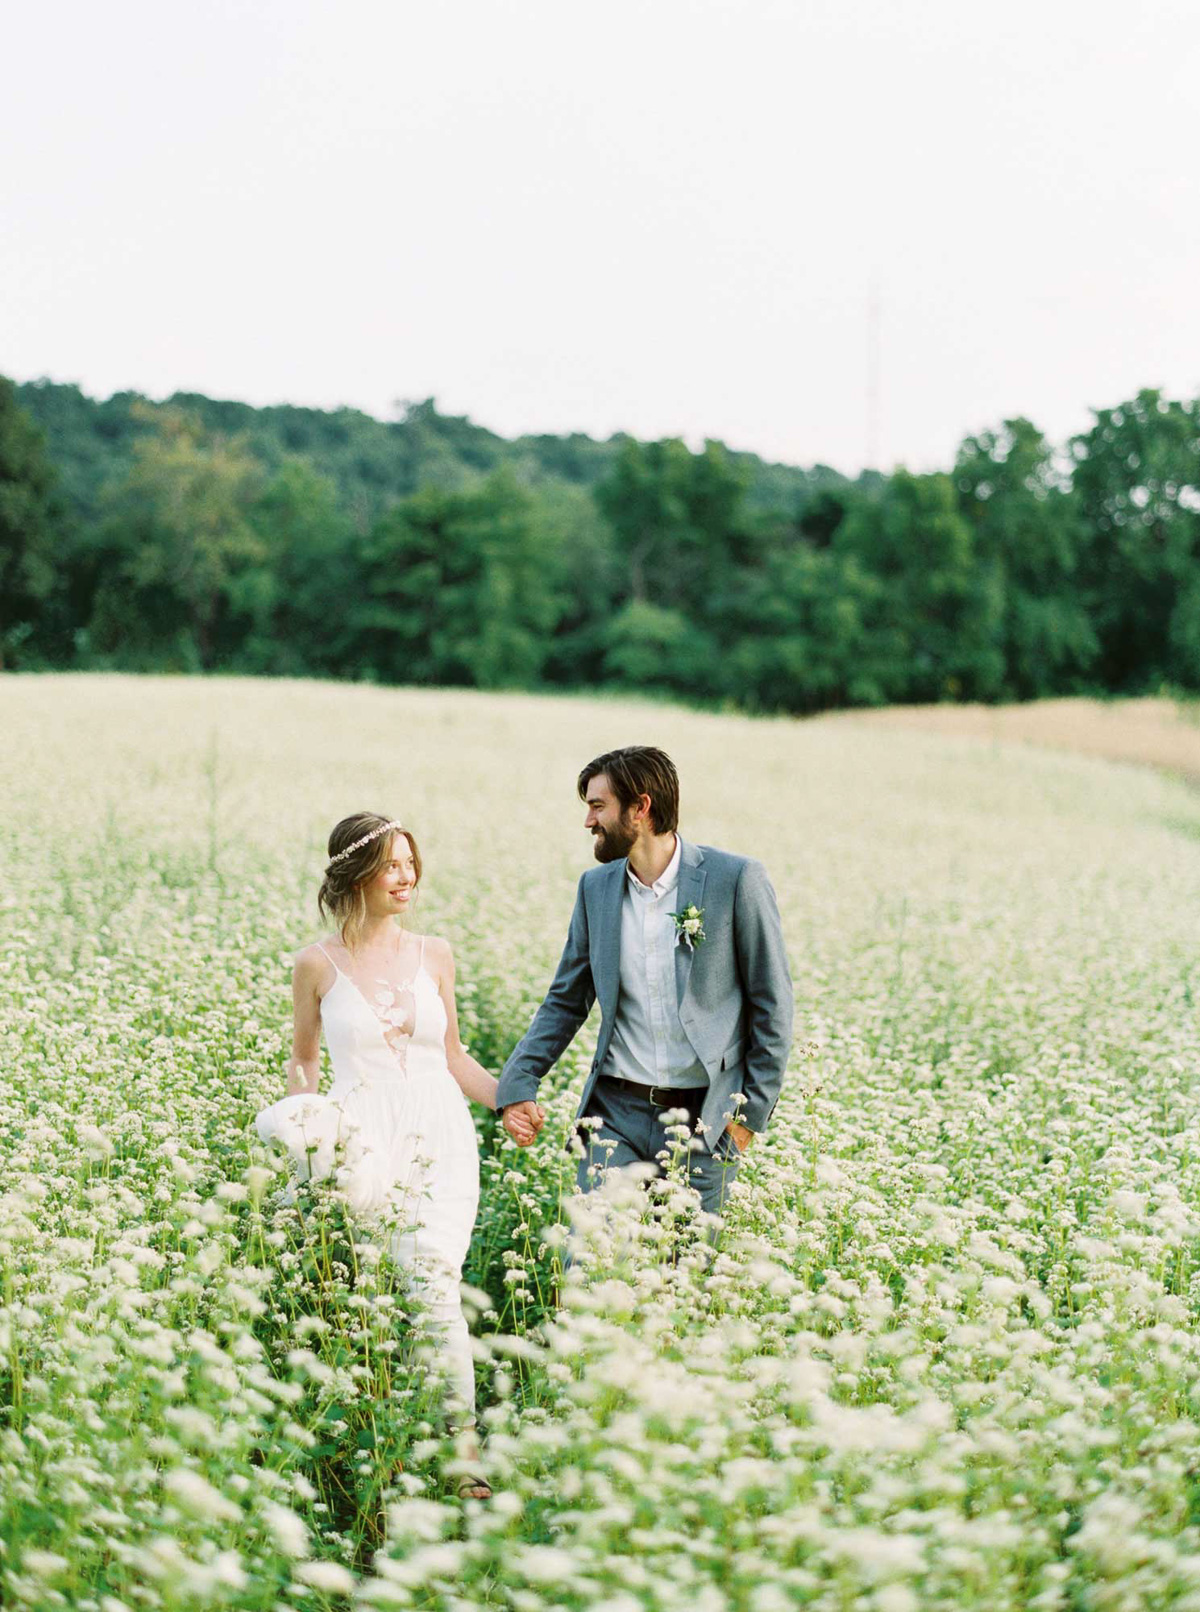 kayla-yestal-vineyard-bride-swish-list-woodland-weddings-niagara-wedding-editorial-36.jpg